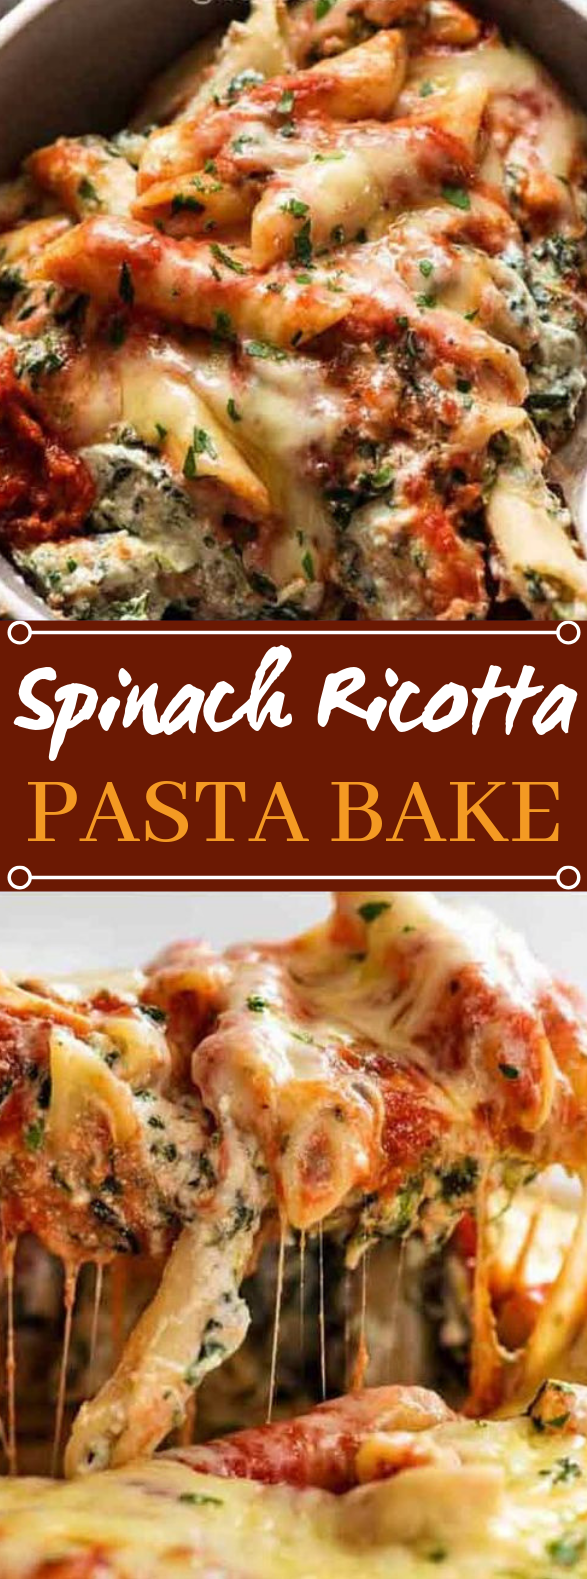 Spinach Ricotta Pasta Bake #dinner #pasta